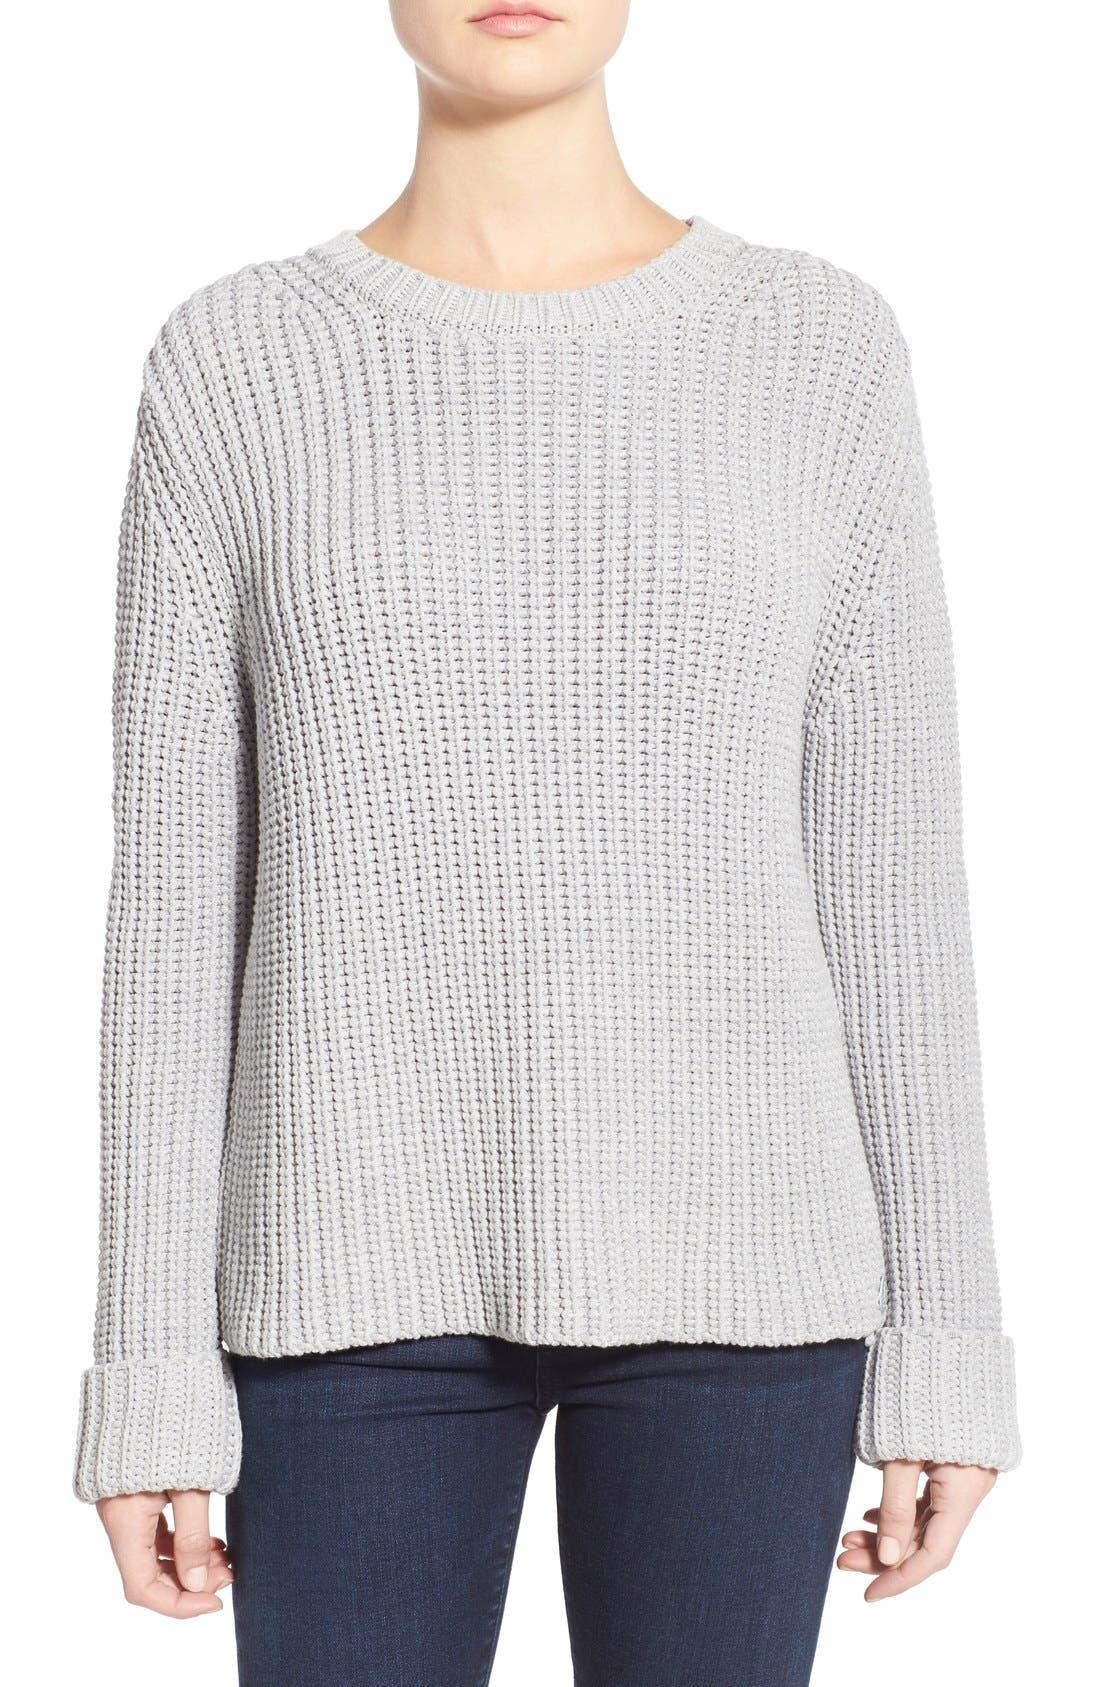 Main Image - Barbour 'Clove Hitch' Crewneck Sweater